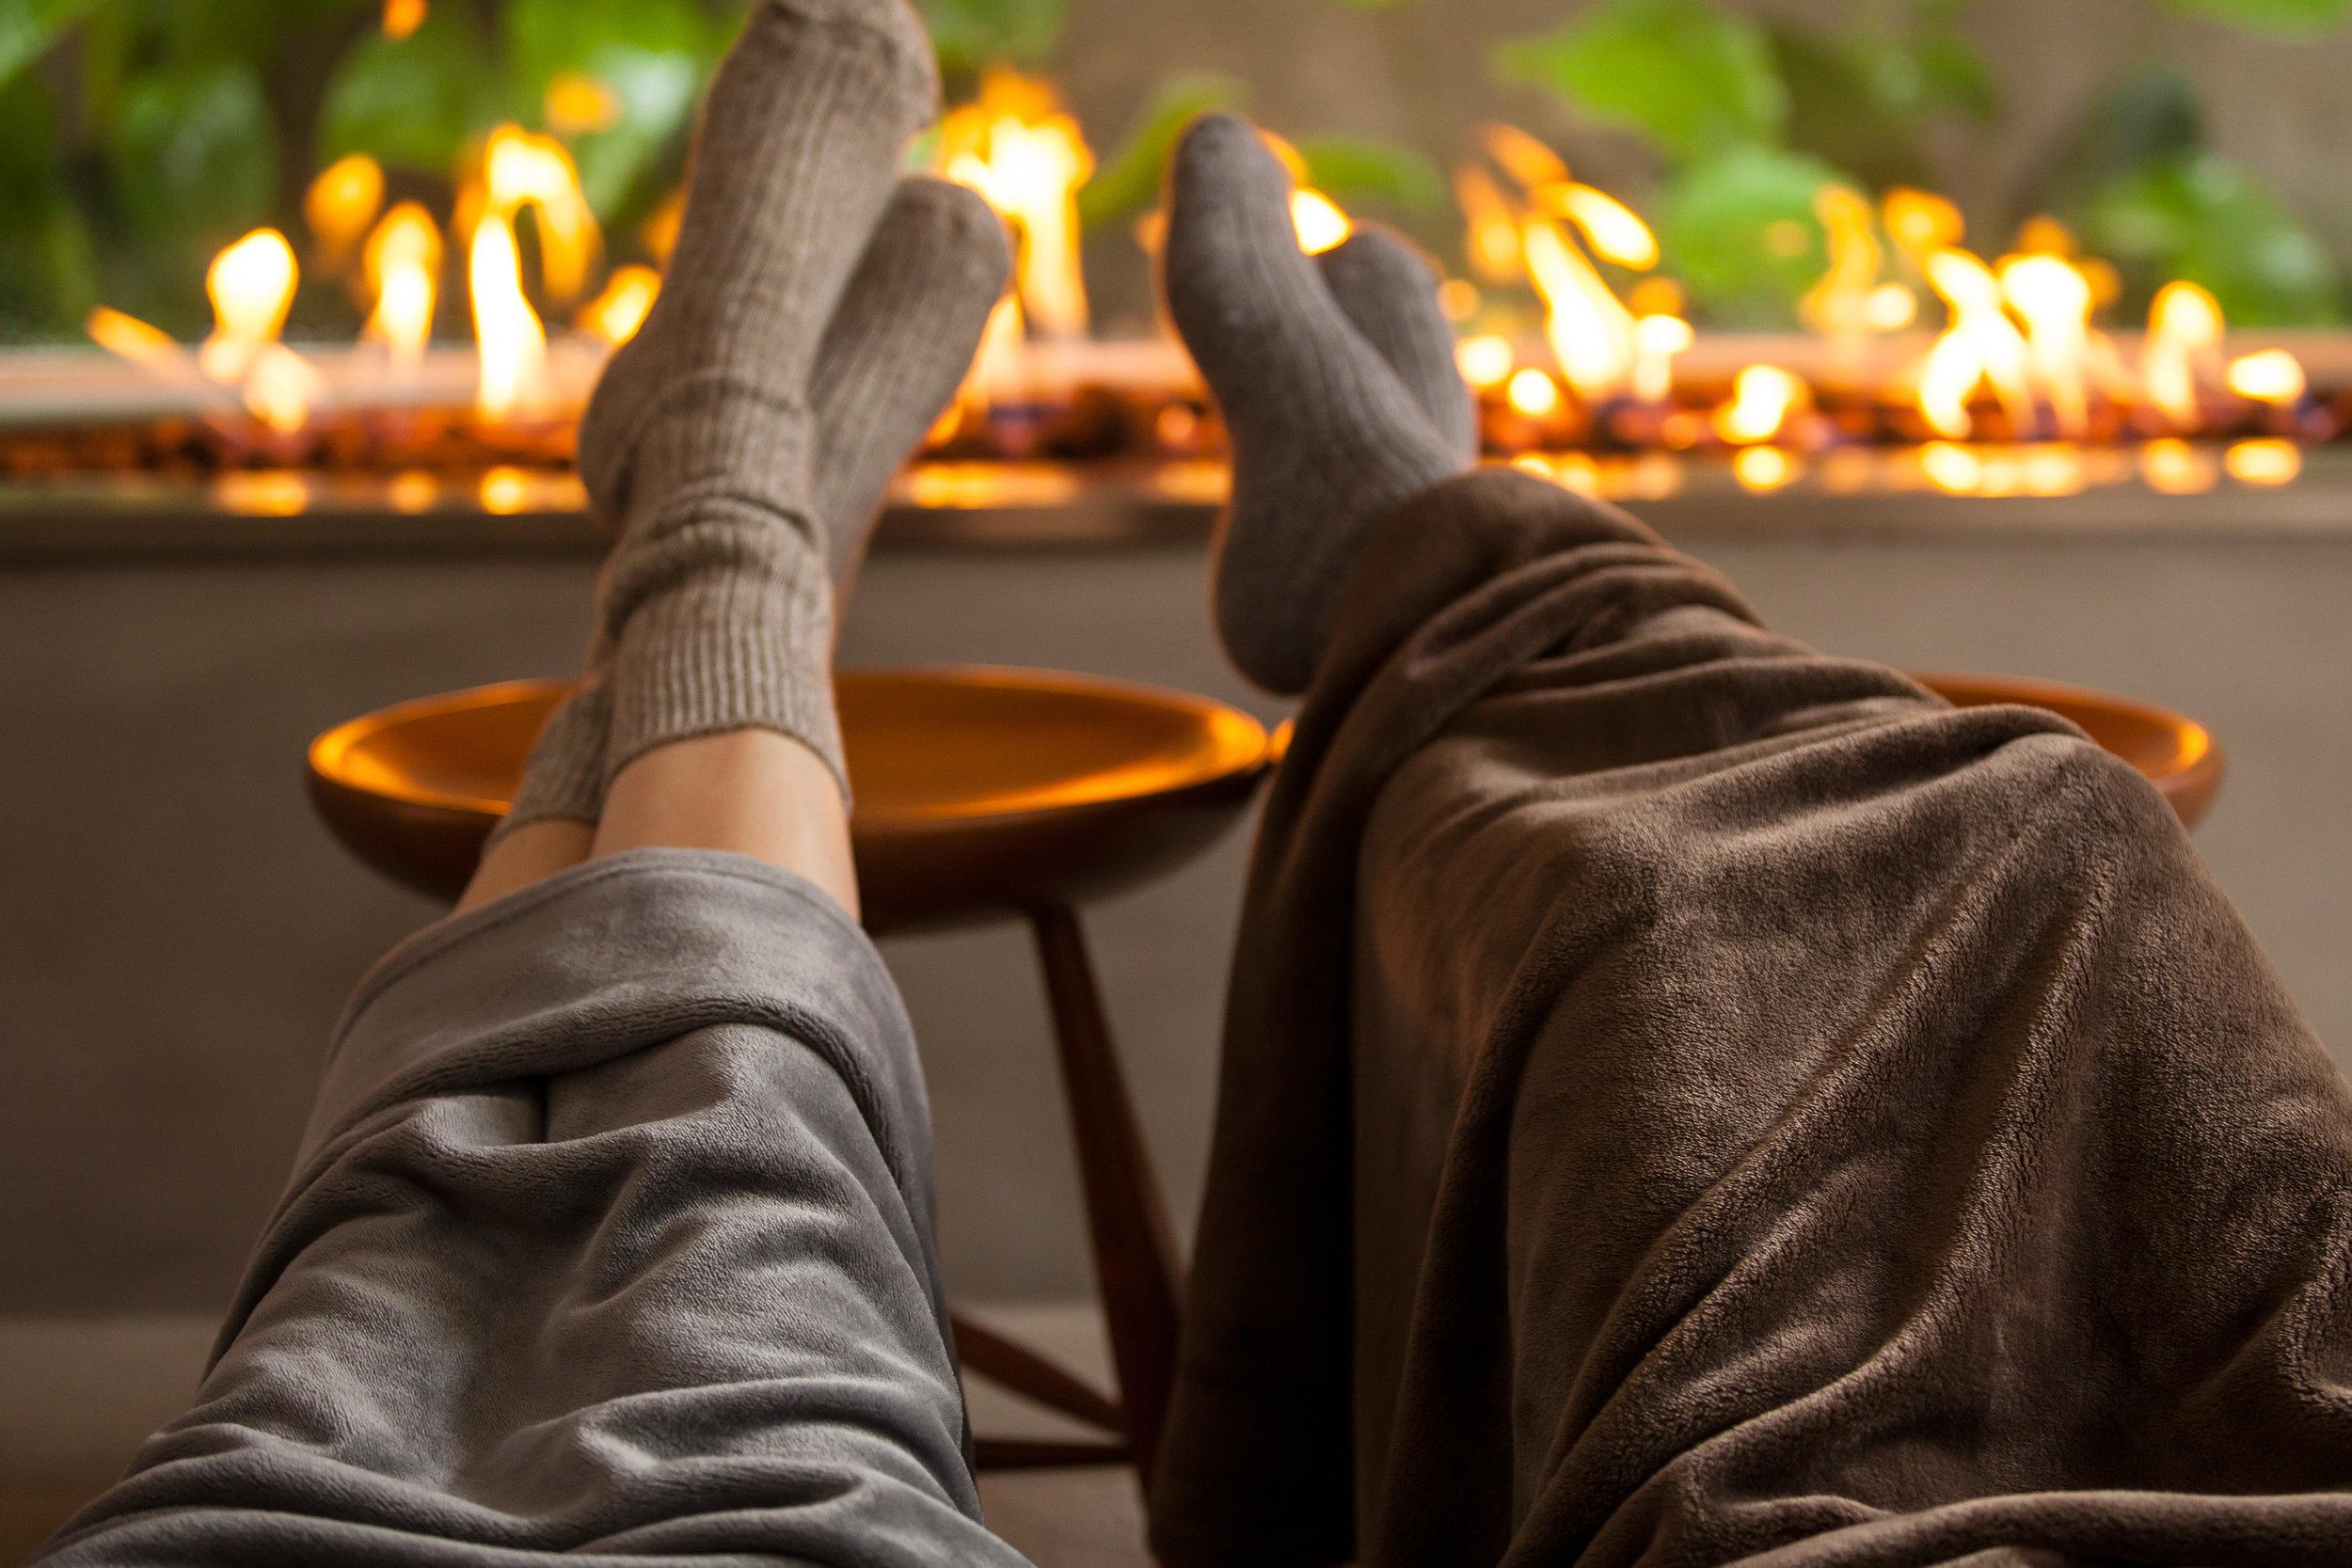 Mantas e cobertores para deixar a casa mais quente no inverno